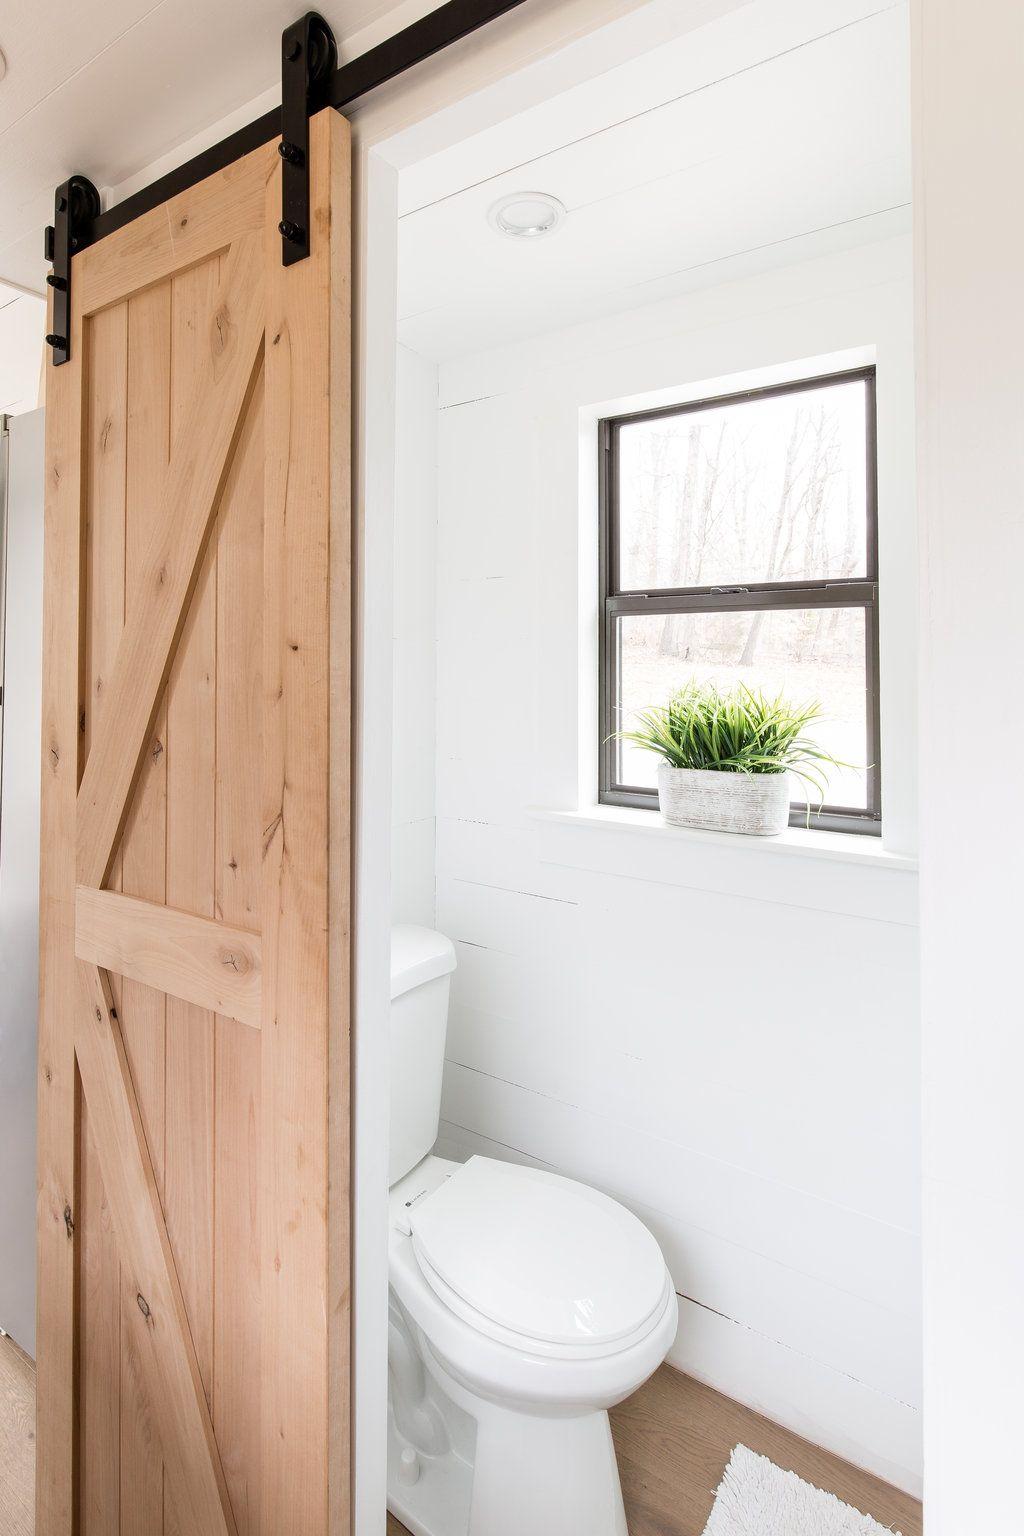 Best 25 Barn door on bathroom ideas on Pinterest  DIY